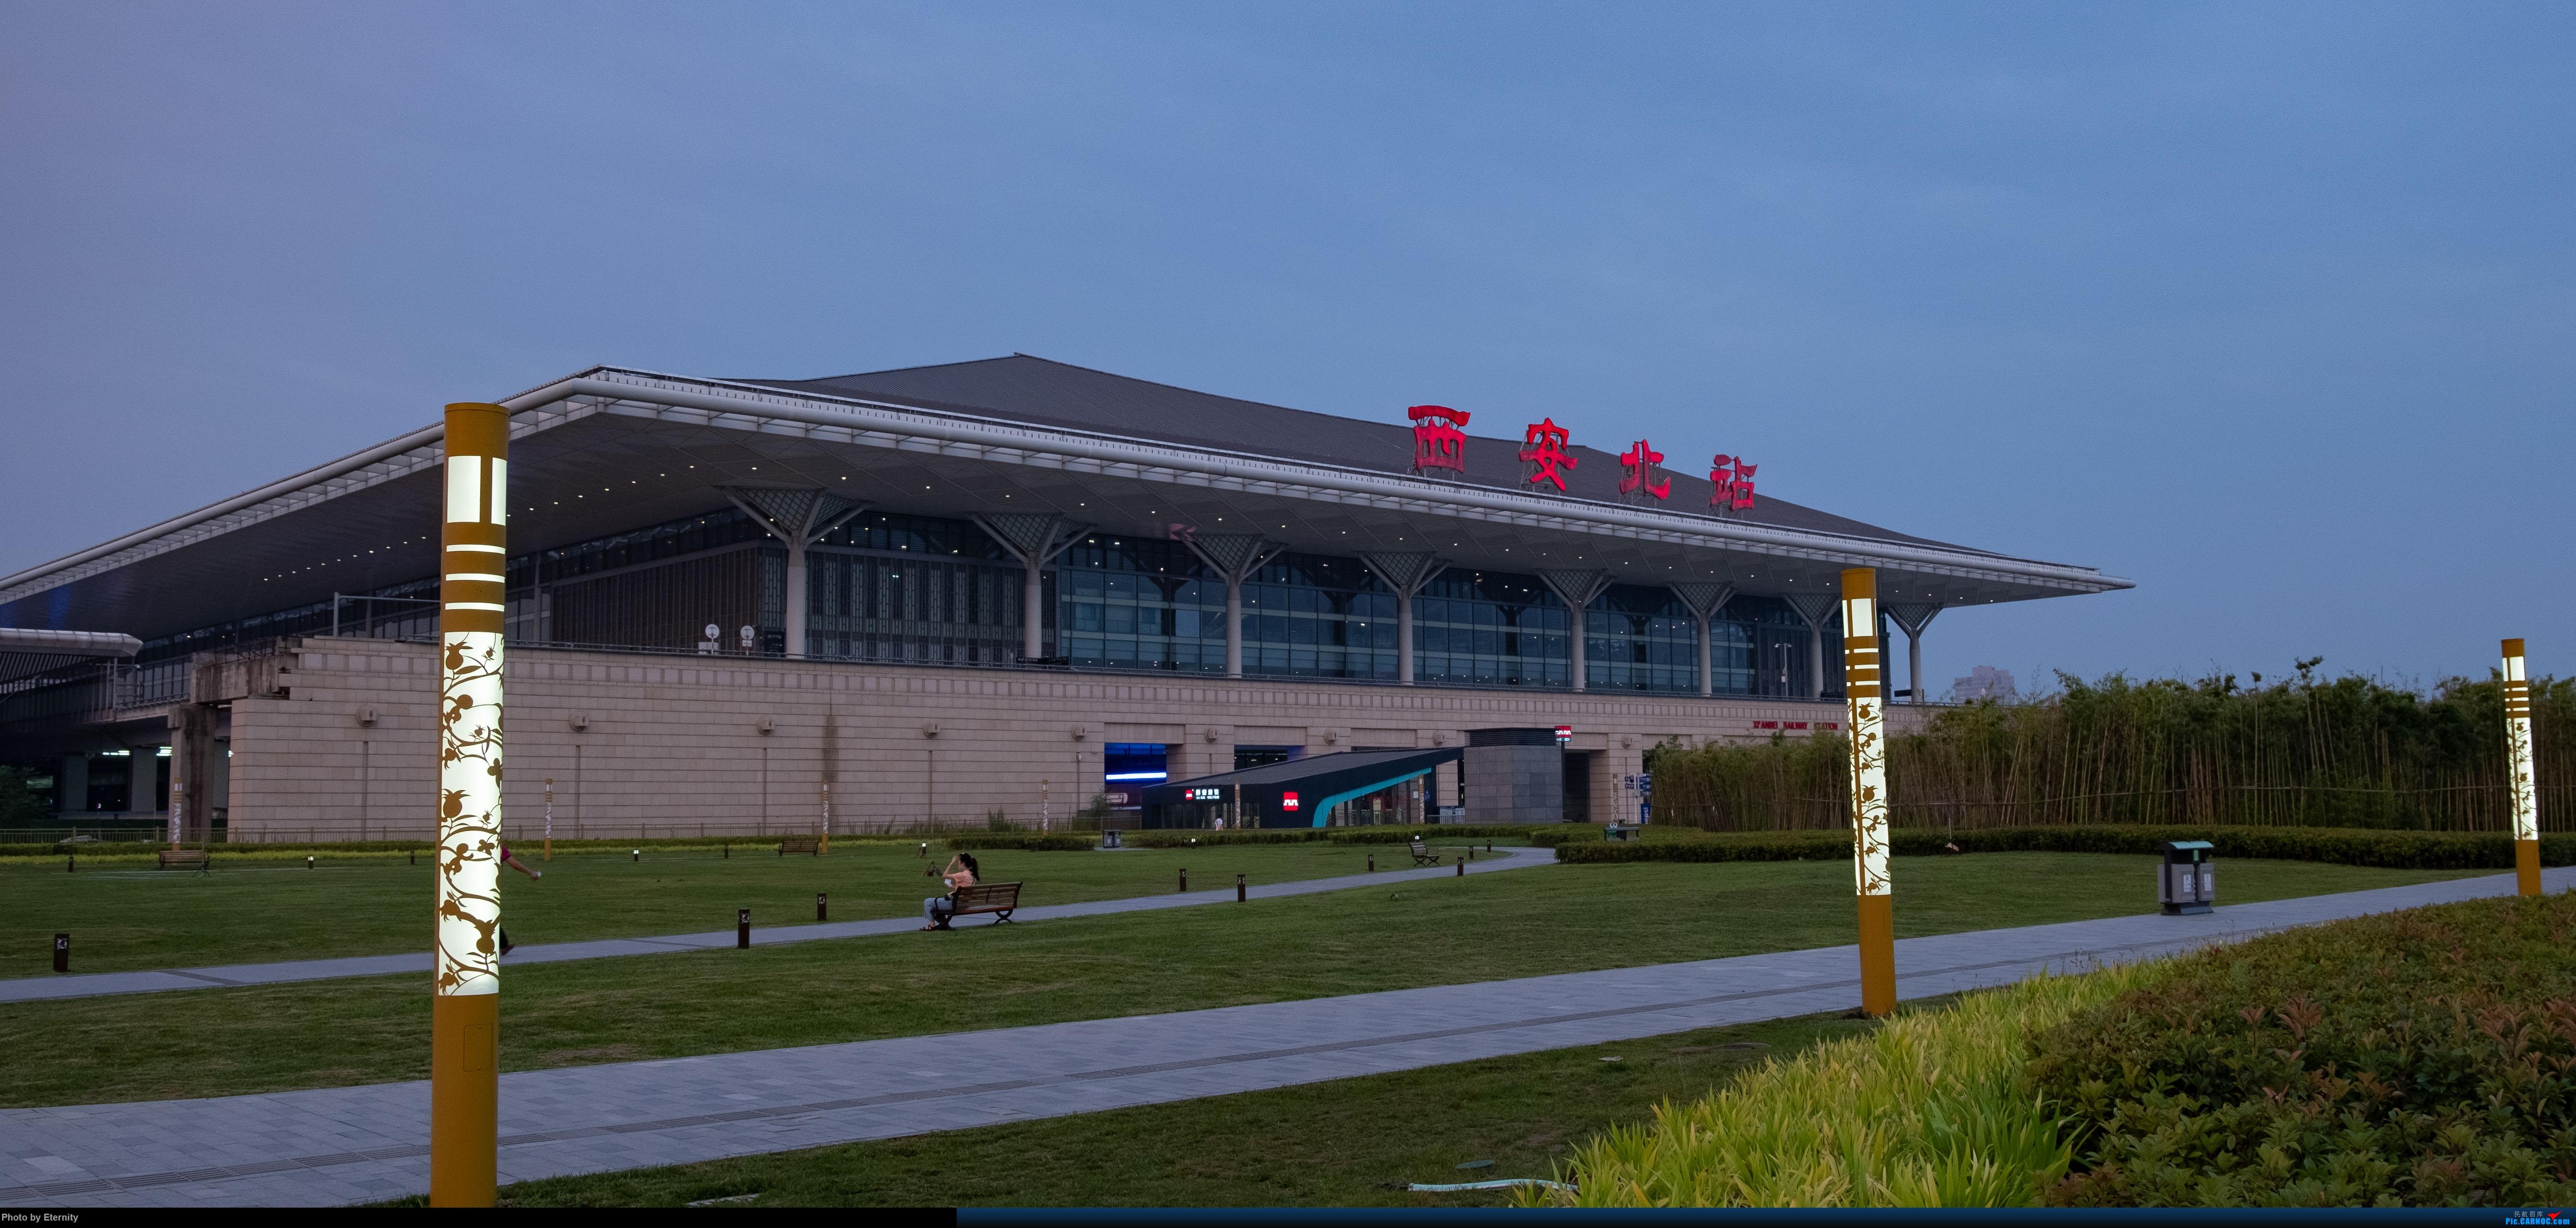 Re:[原创]后疫情期间的暑假国内游|西安-上海-广州-成都|体验国内3条干线|吉祥航空787|南航350|海航737